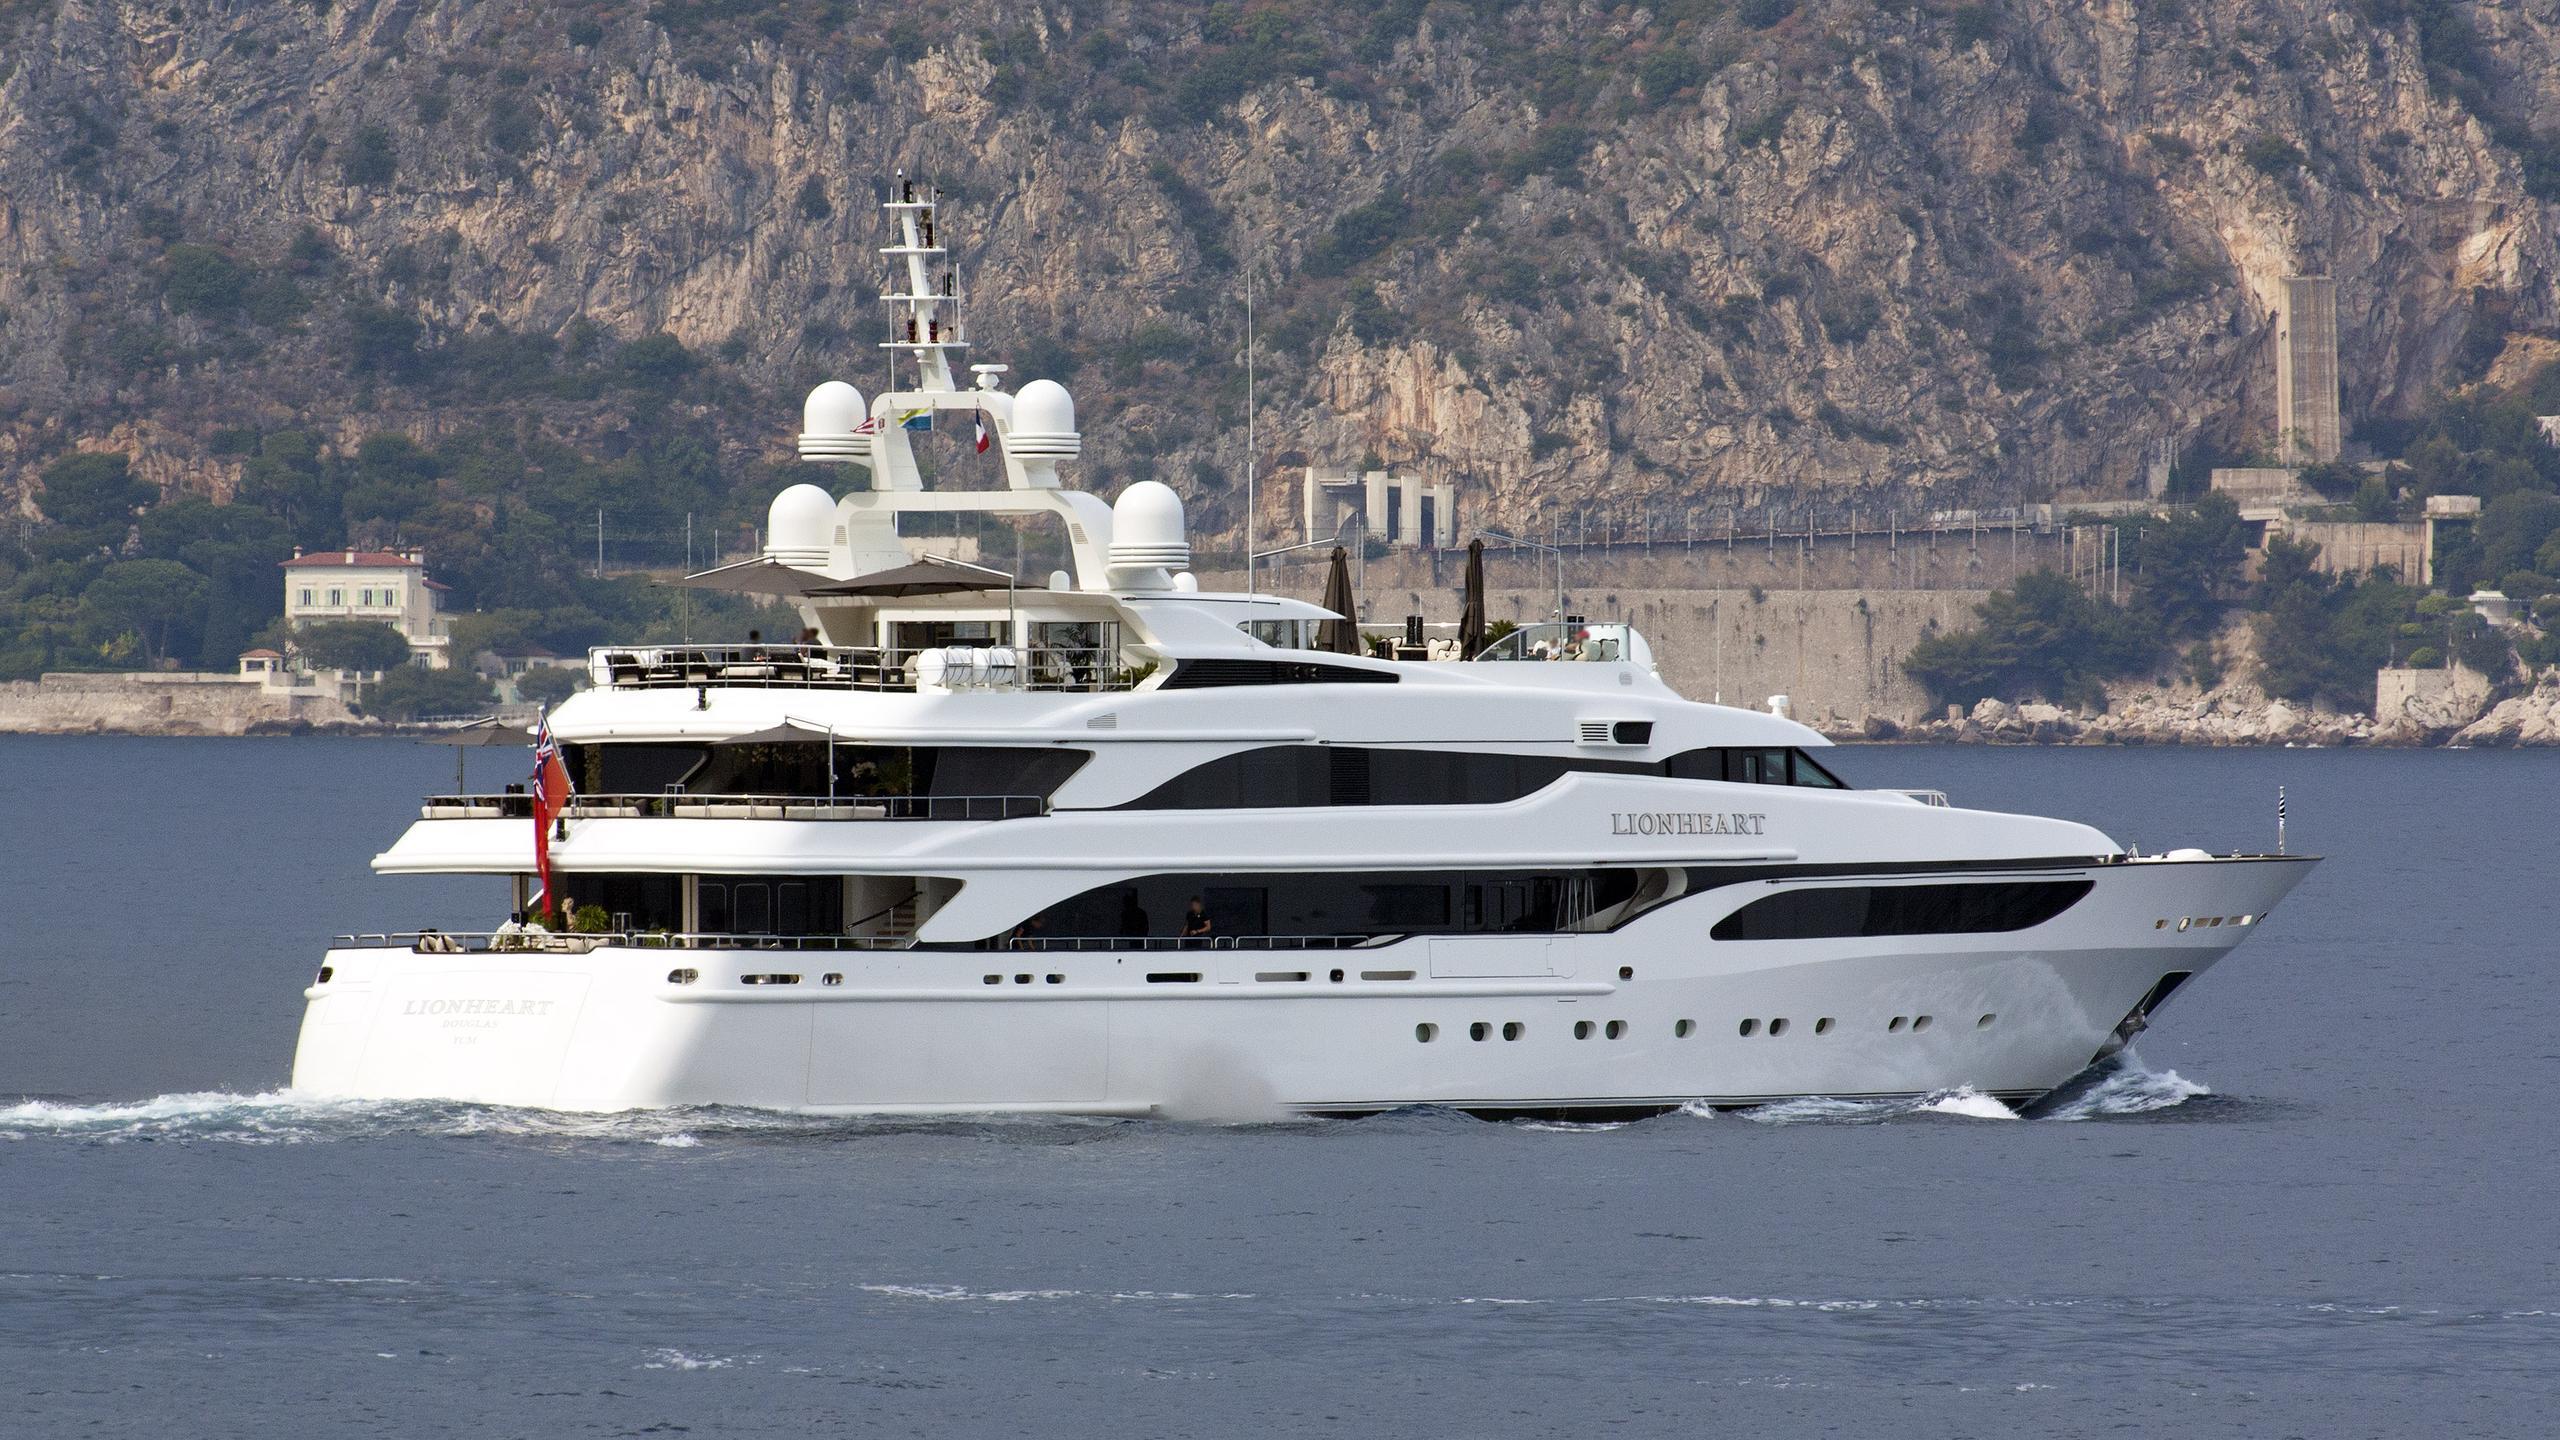 lioness-v-motor-yacht-benetti-2006-63m-half-profile